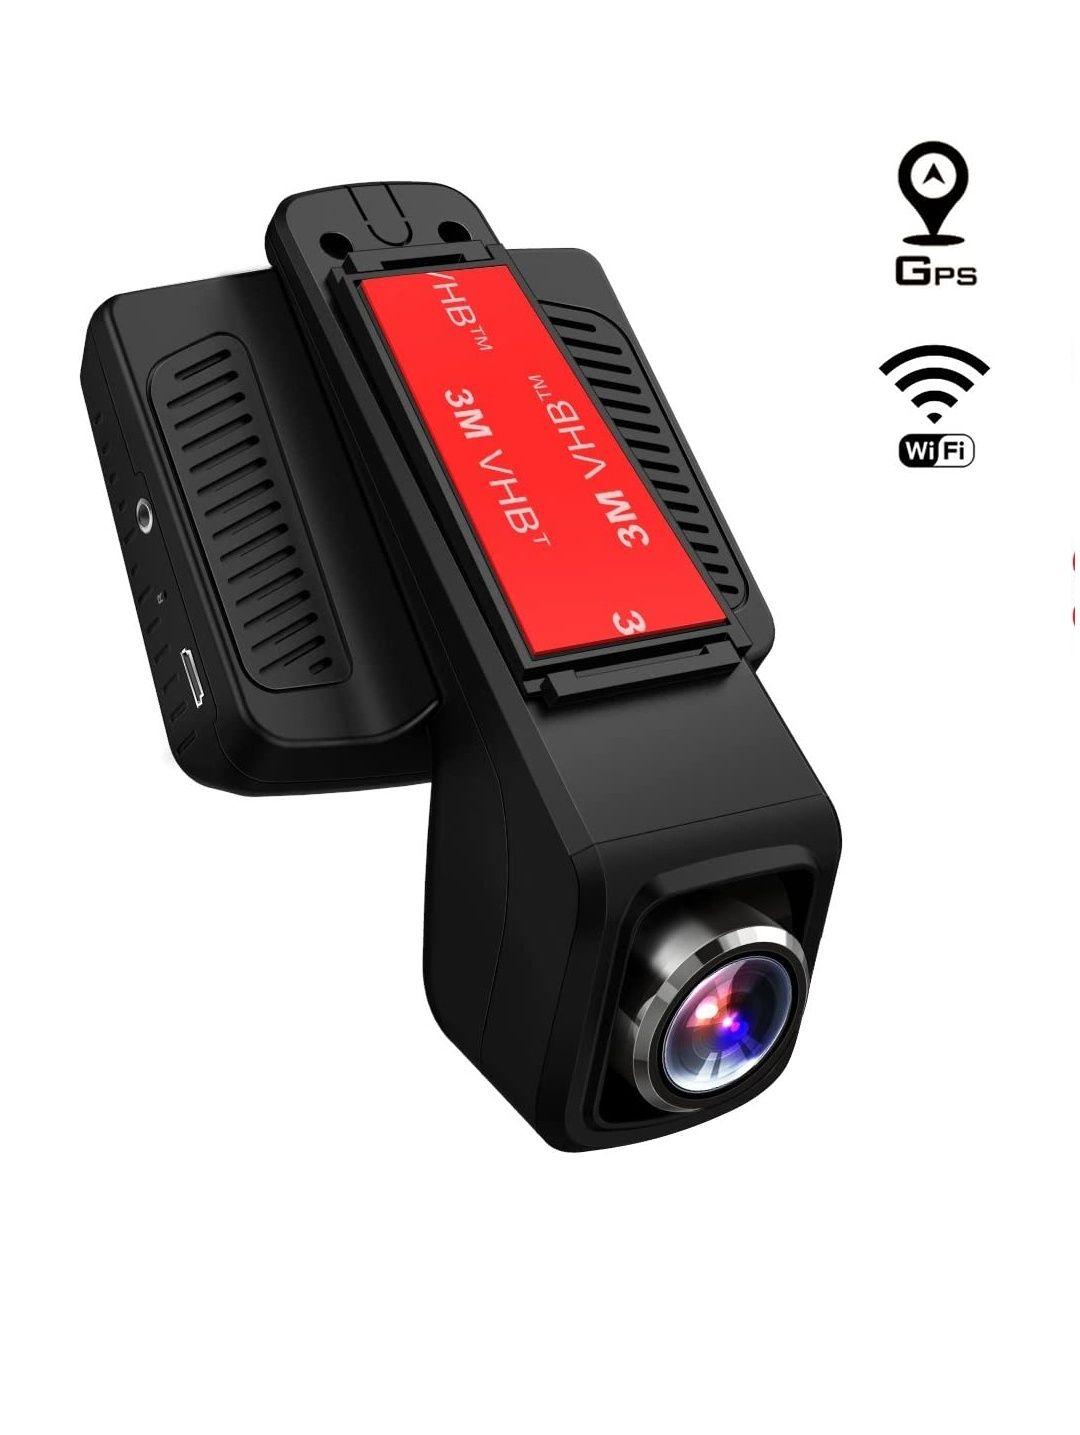 "Caméra embarquée Toguard CE20G - Full HD, GPS, WiFi, Angle de 170 Degrés, Écran 2.45"" (Vendeur tiers)"